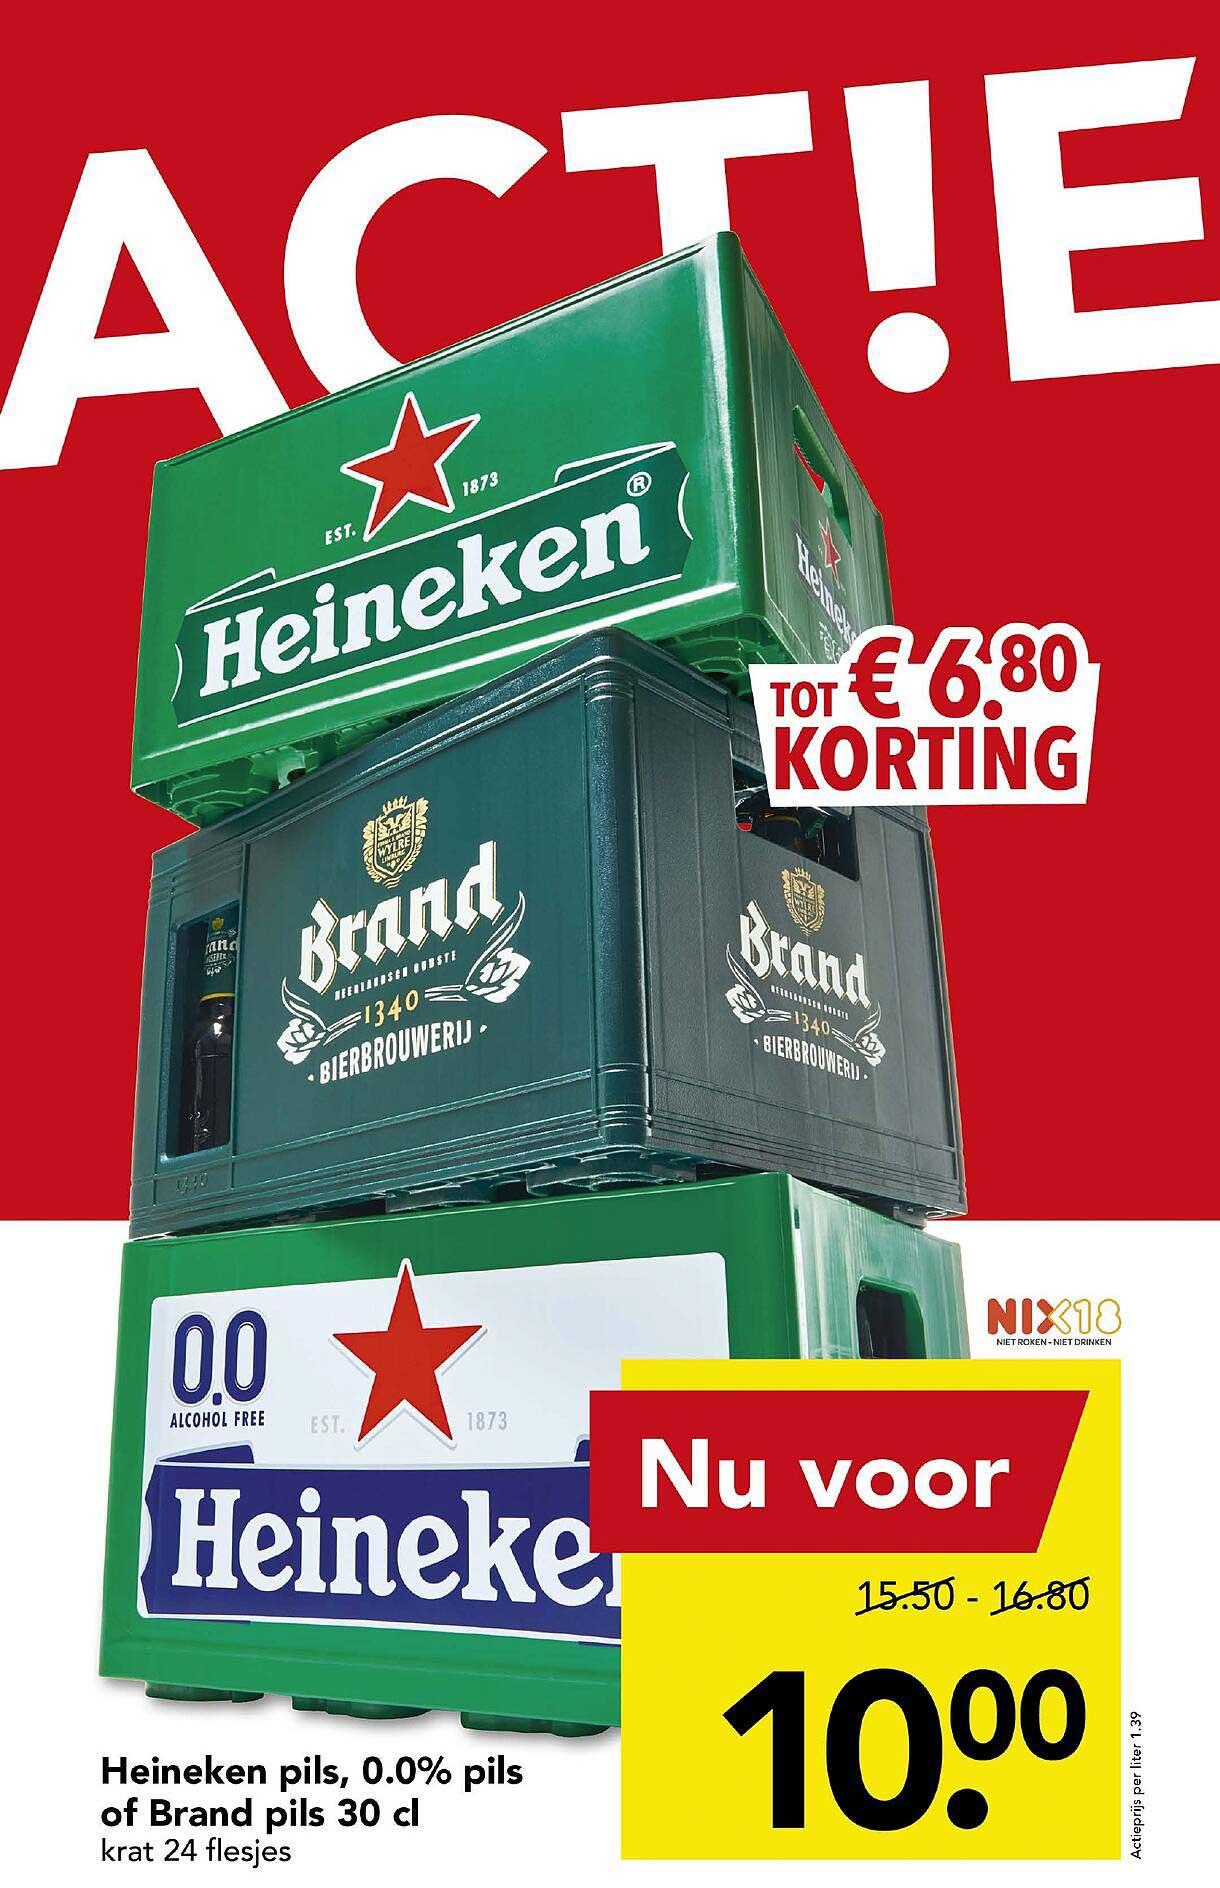 DEEN Heineken Pils, 0.0% Pils Of Brand Pils 30 Cl Tot € 6.80 Korting